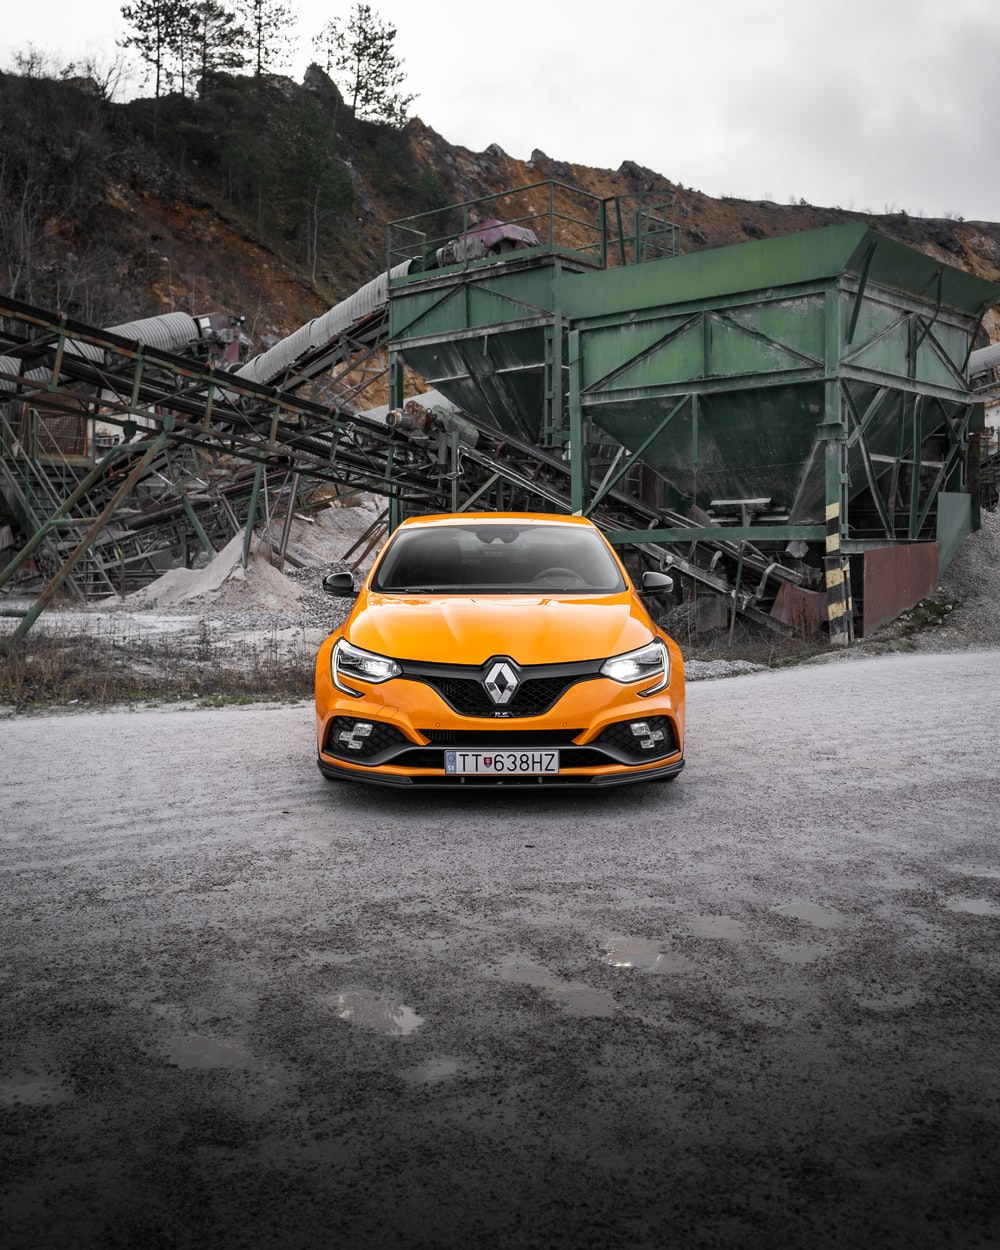 yellow car on gray asphalt road during daytime